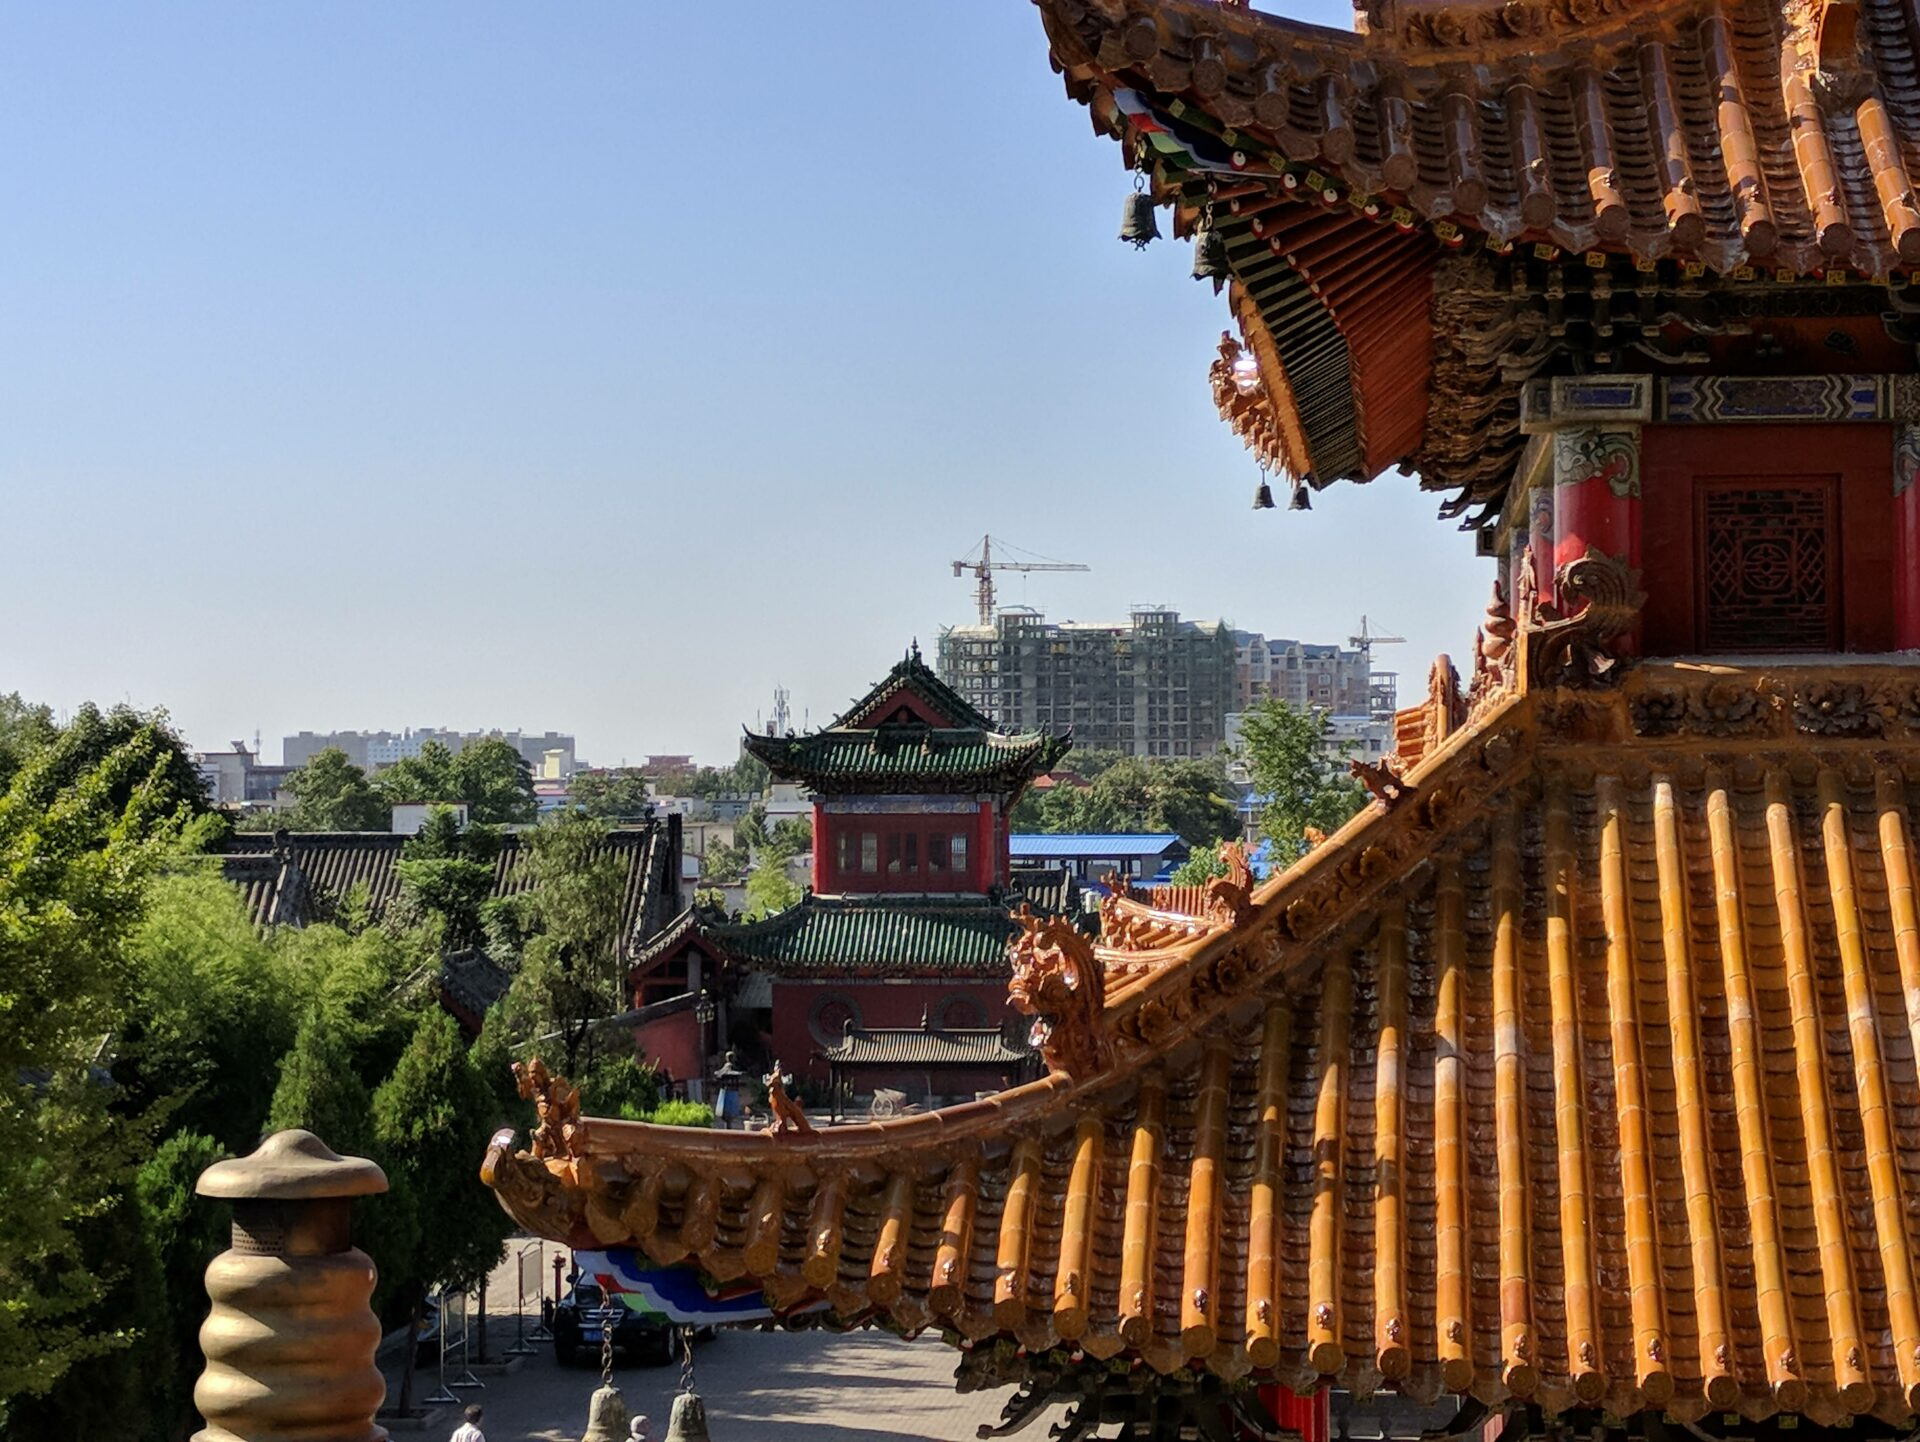 Lianzhen Temple